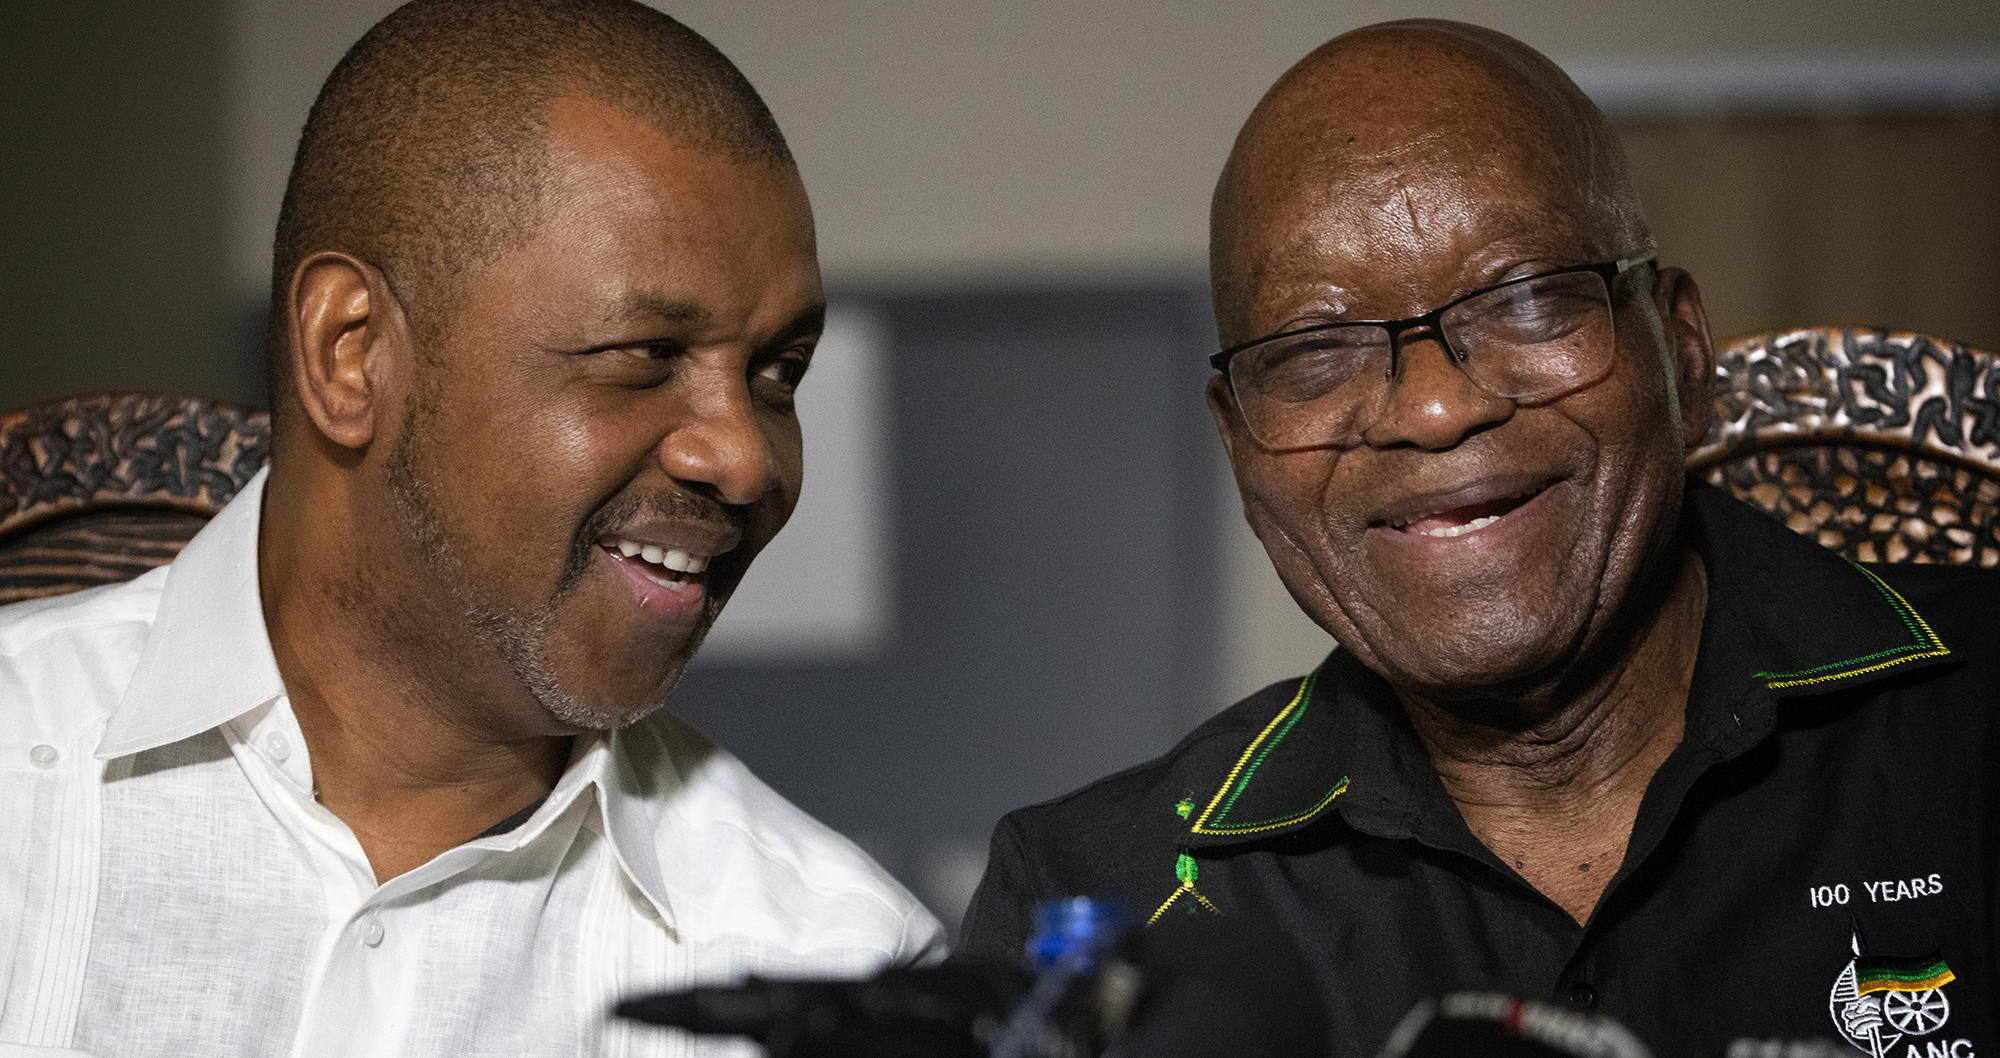 DM168 TONGUE IN CHEEK: Mysterious Zuma takes it lying down